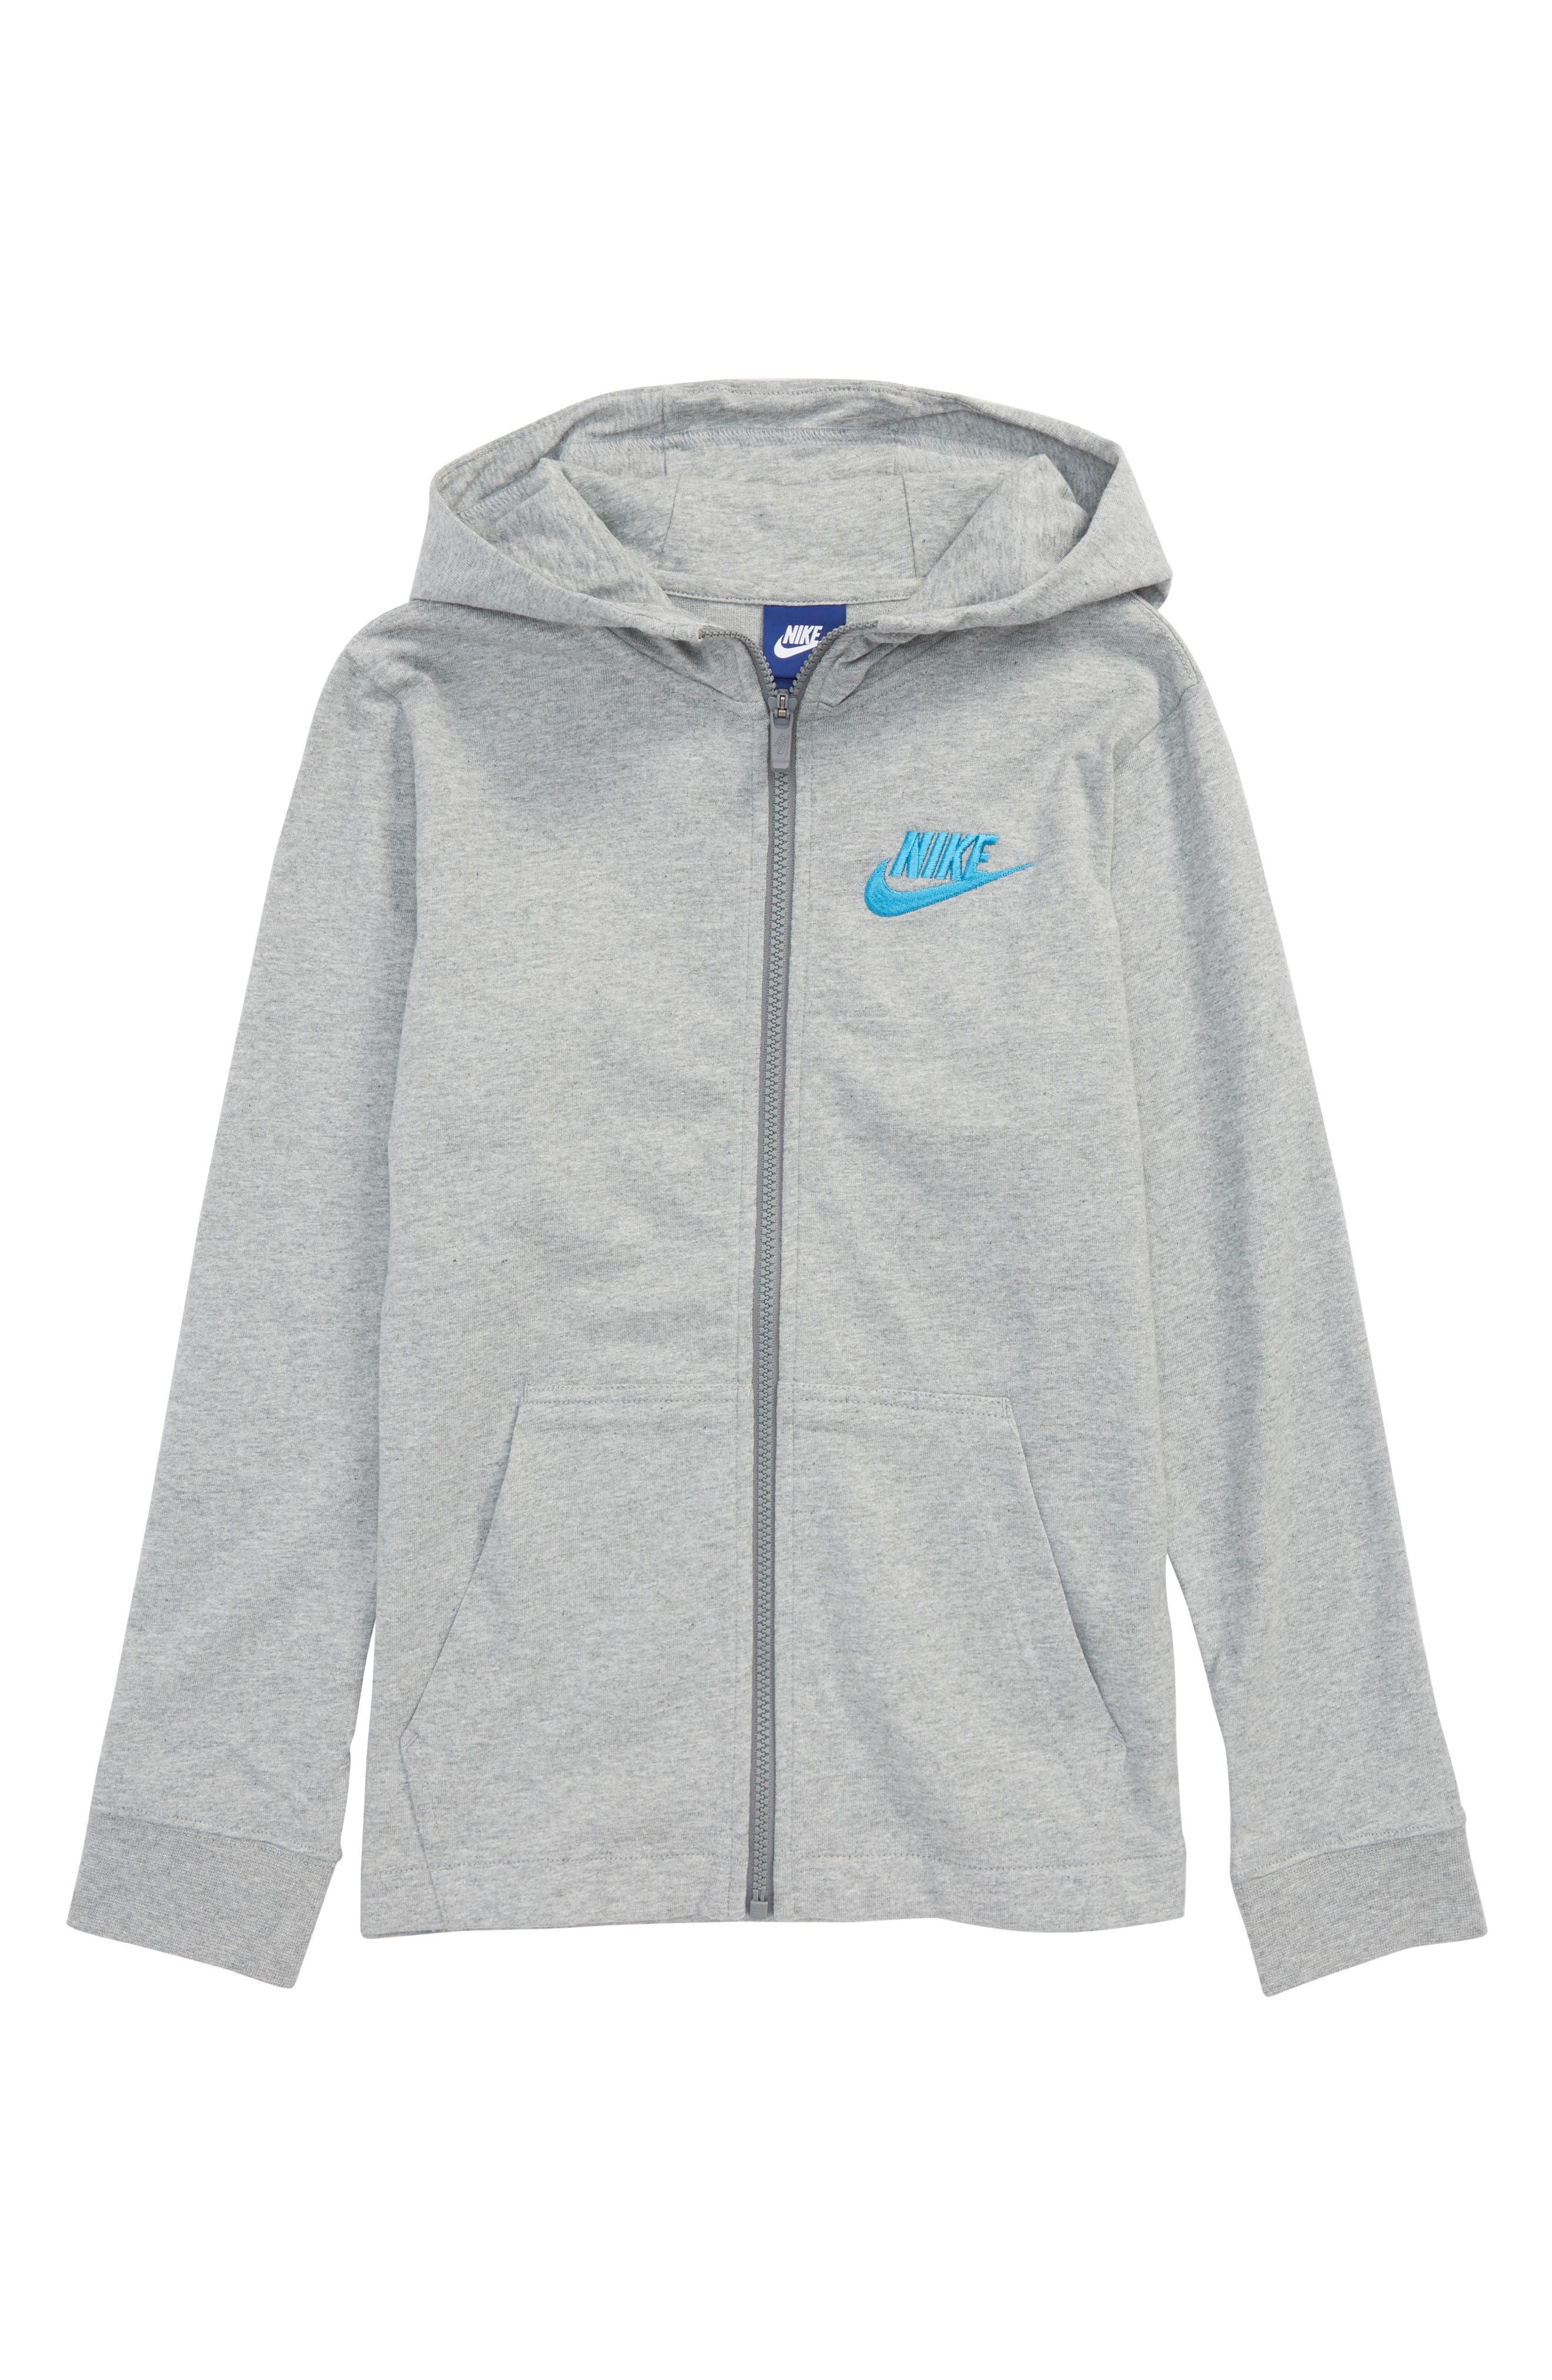 Full Zip Hoodie,                         Main,                         color, Dark Heather/ Equator Blue